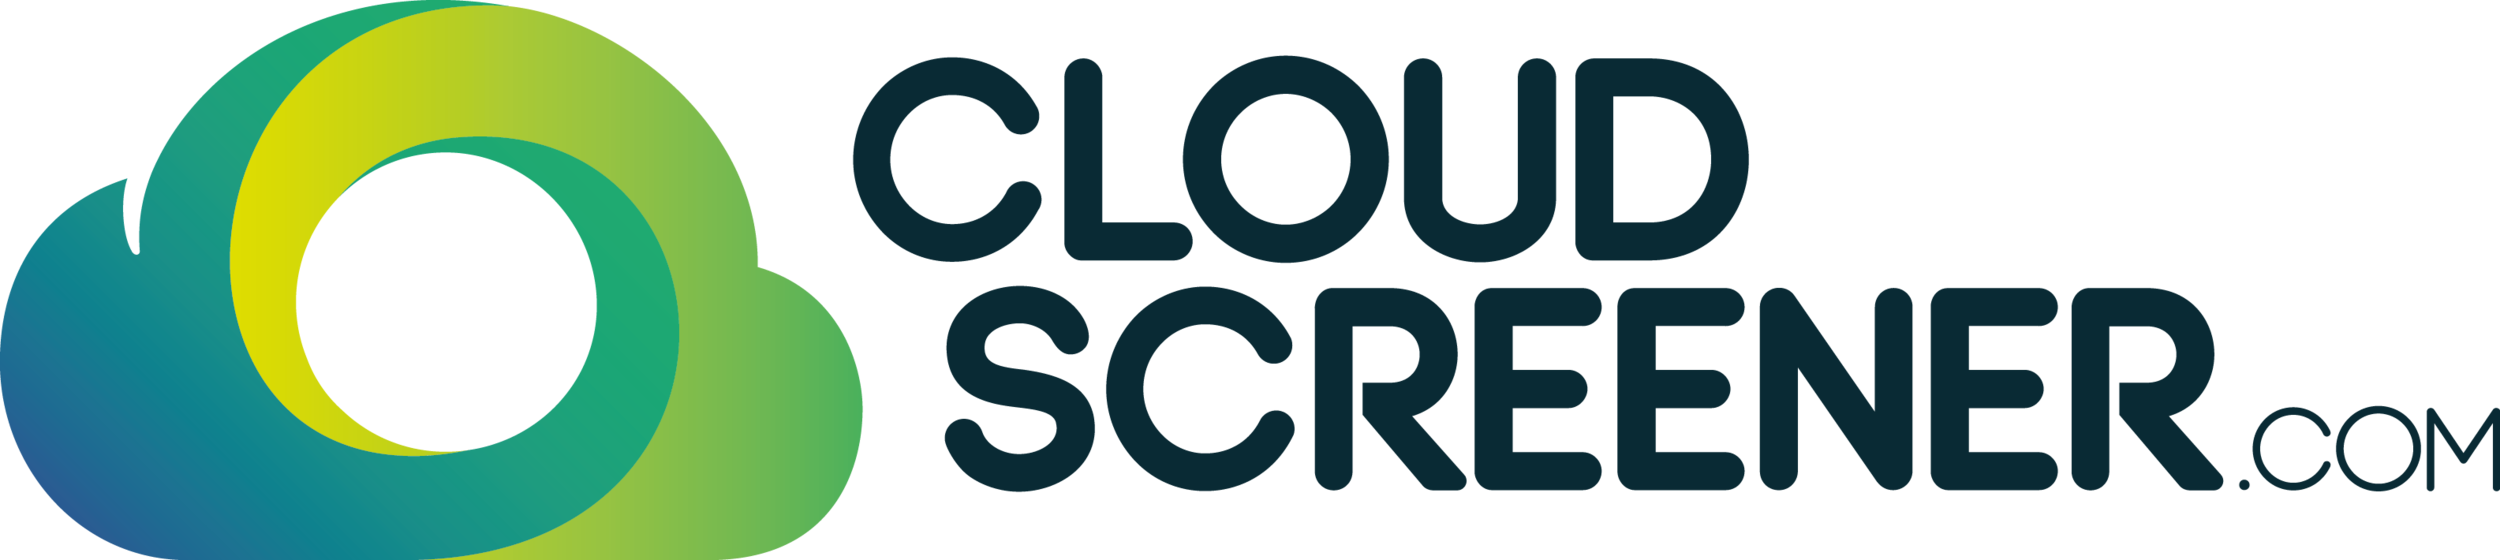 cloudscreener_logo_CMJN_fonce.png